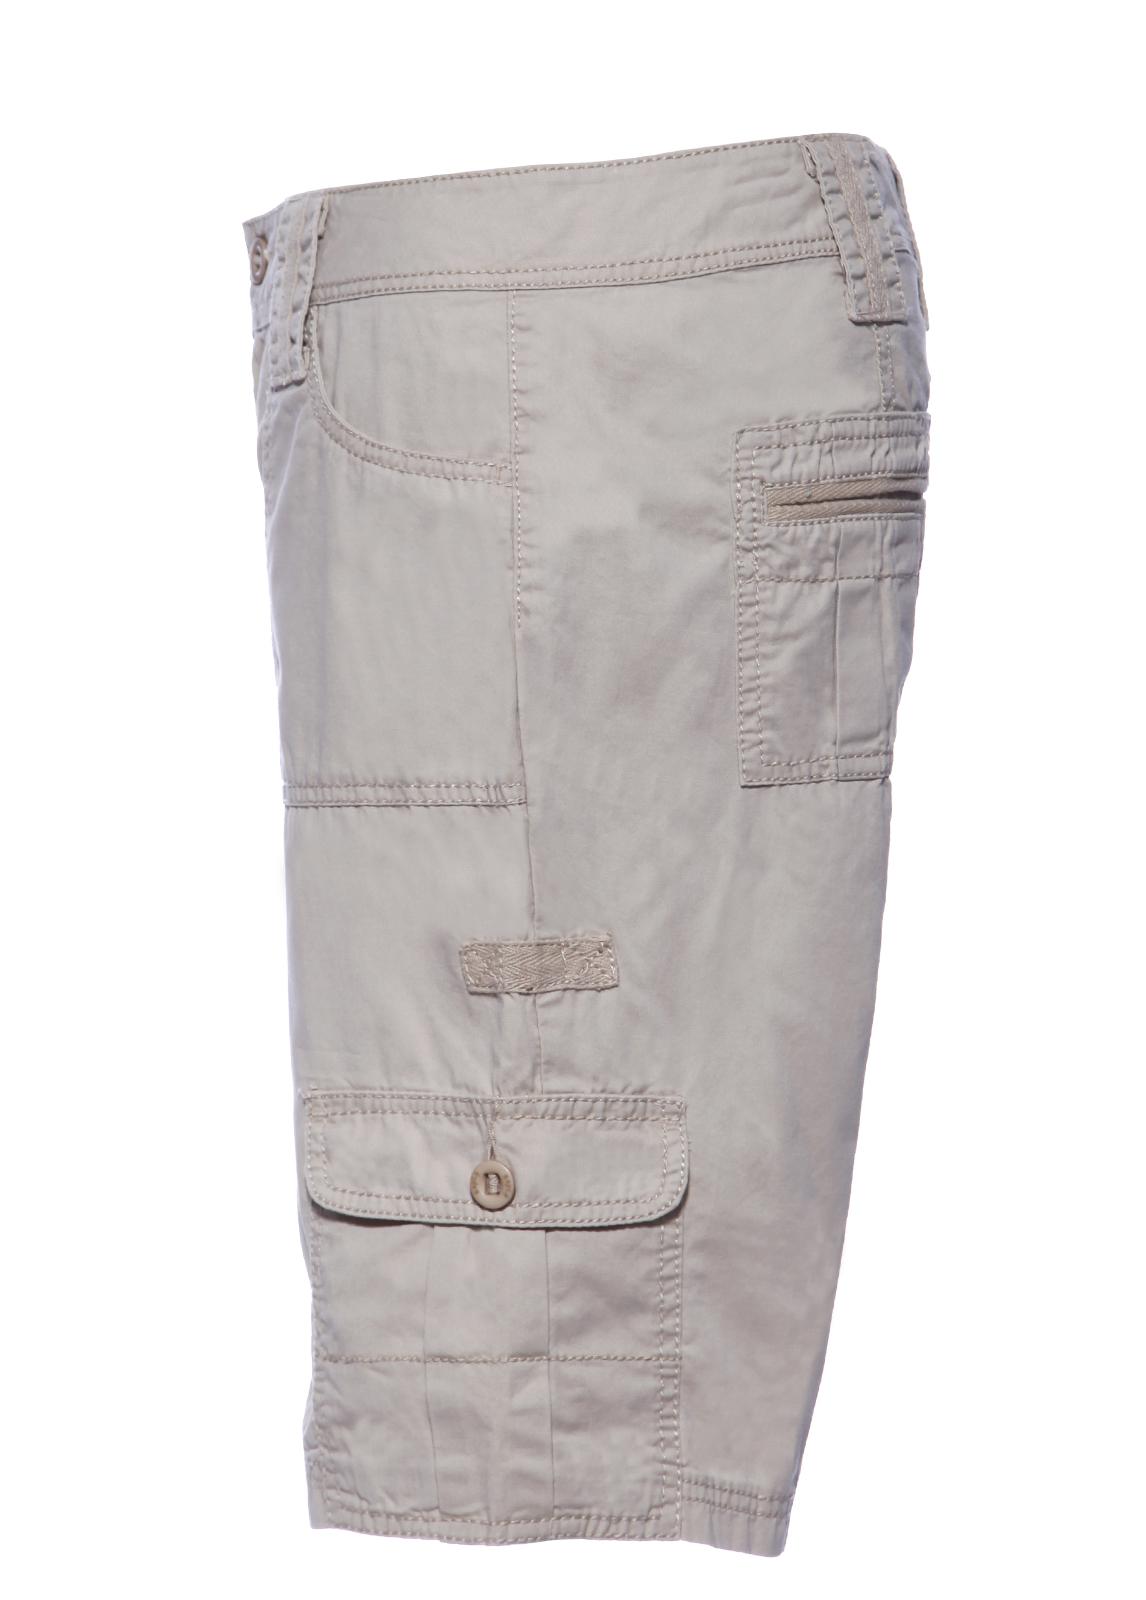 Ladies/Women Outdoor Flat Pocket Shorts 100% Cotton